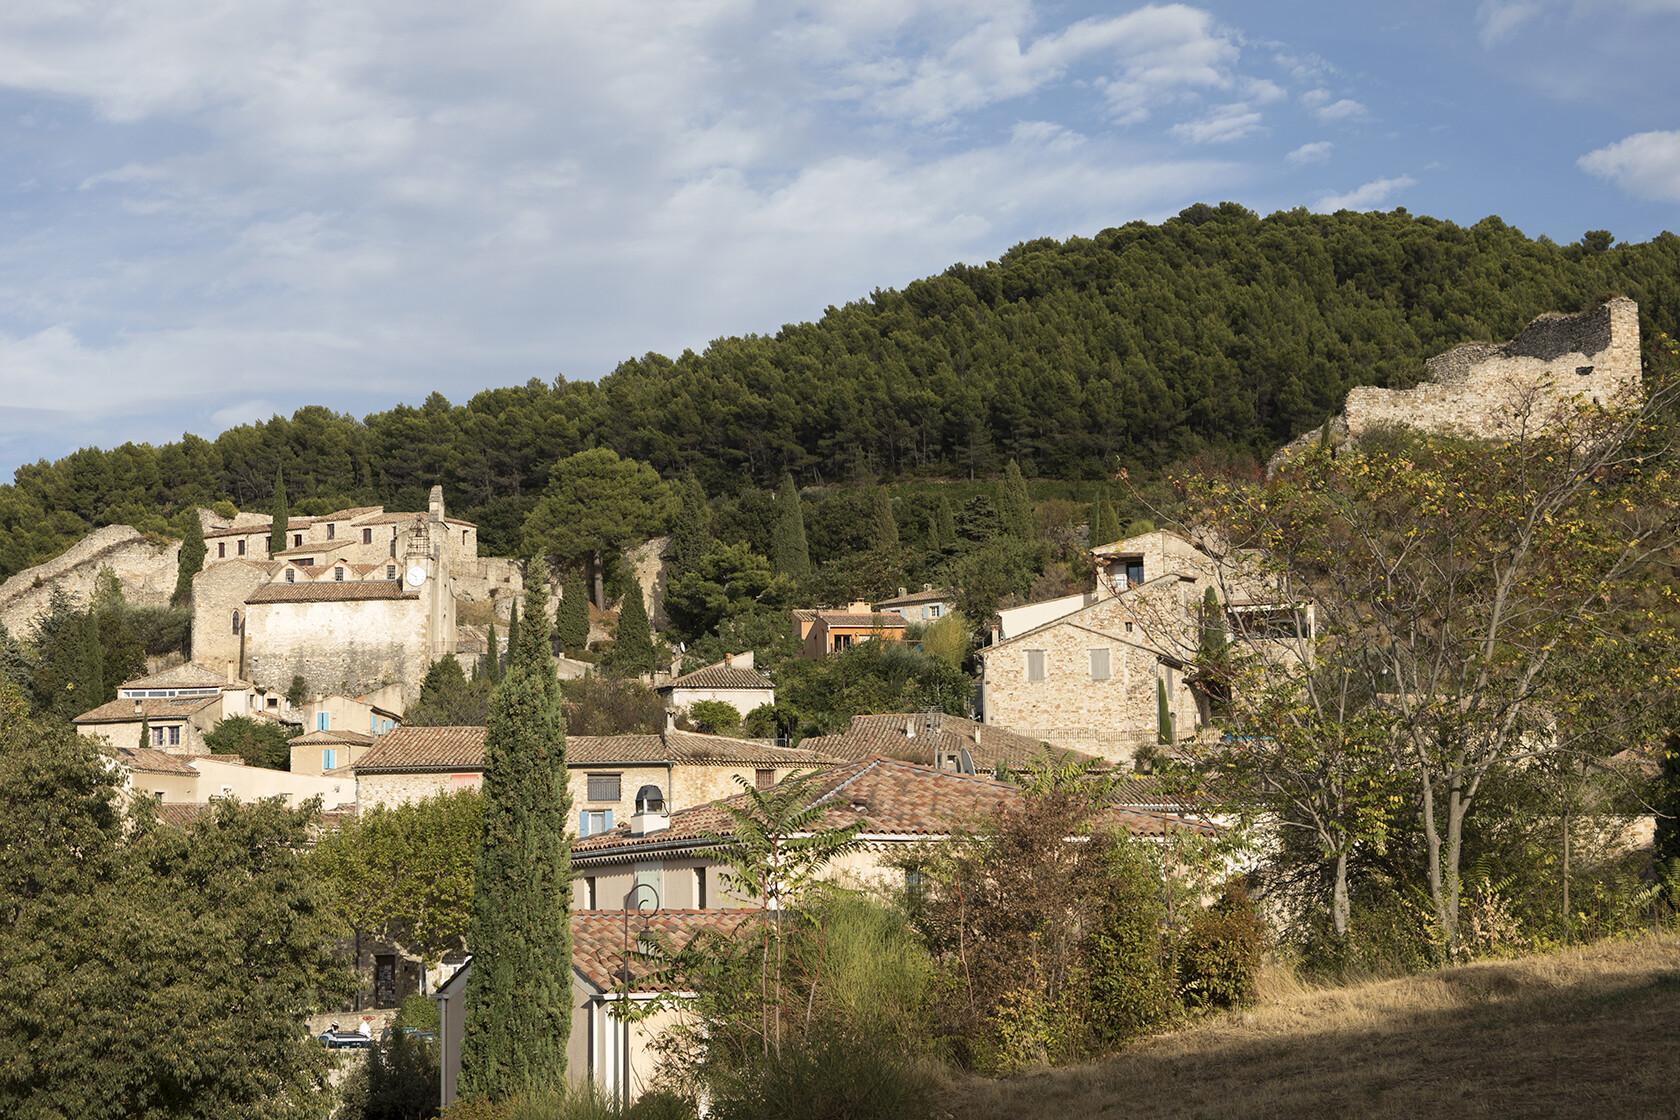 Côtes-du-Rhône Wine Village of Gigondas in the Vaucluse